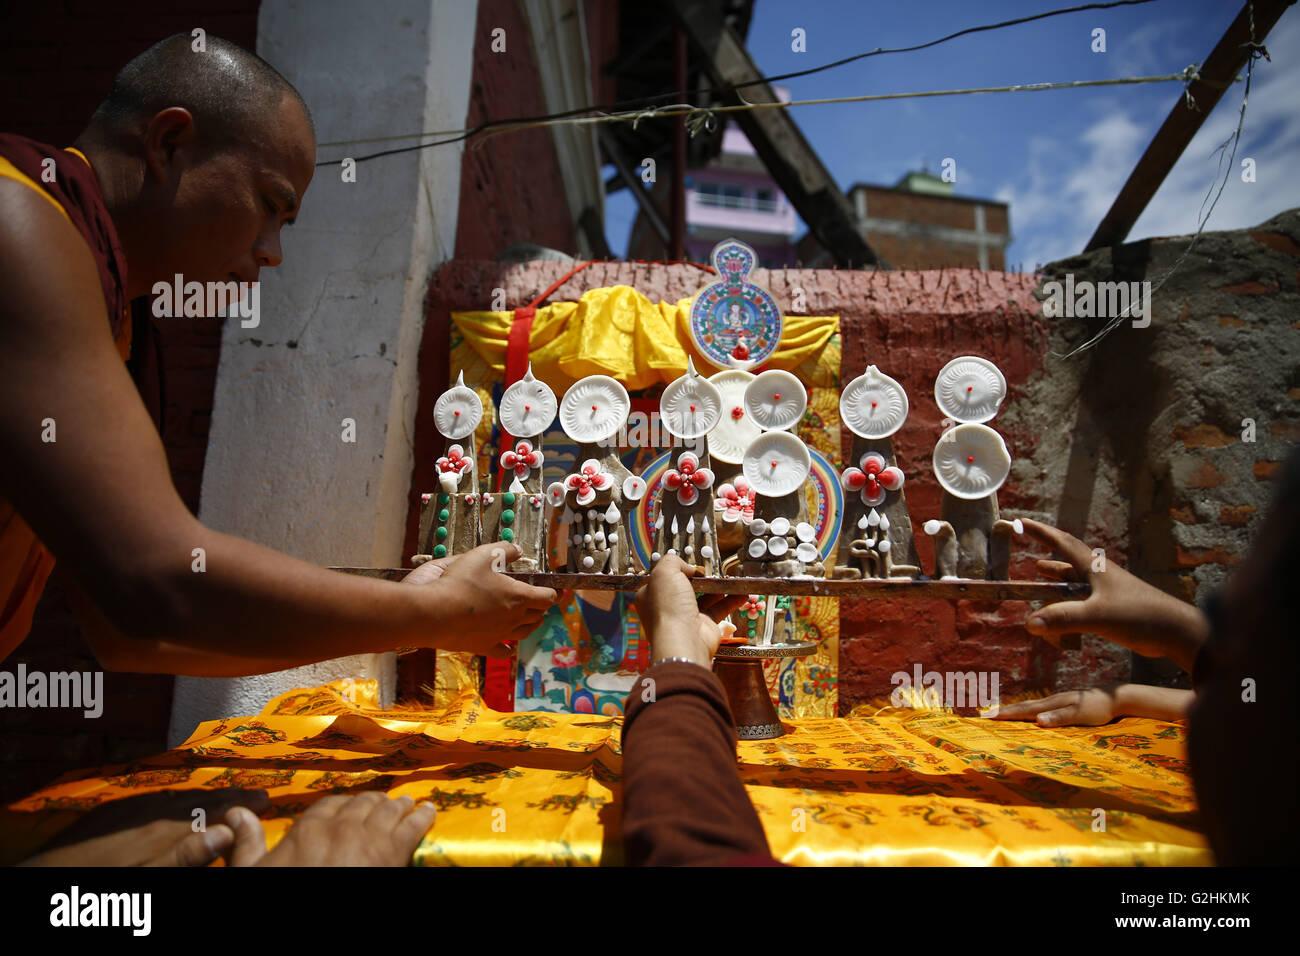 Kathmandu, Nepal. 31st May, 2016. Buddhist Monks arrange idols before performing final rites to Revered Buddhist - Stock Image